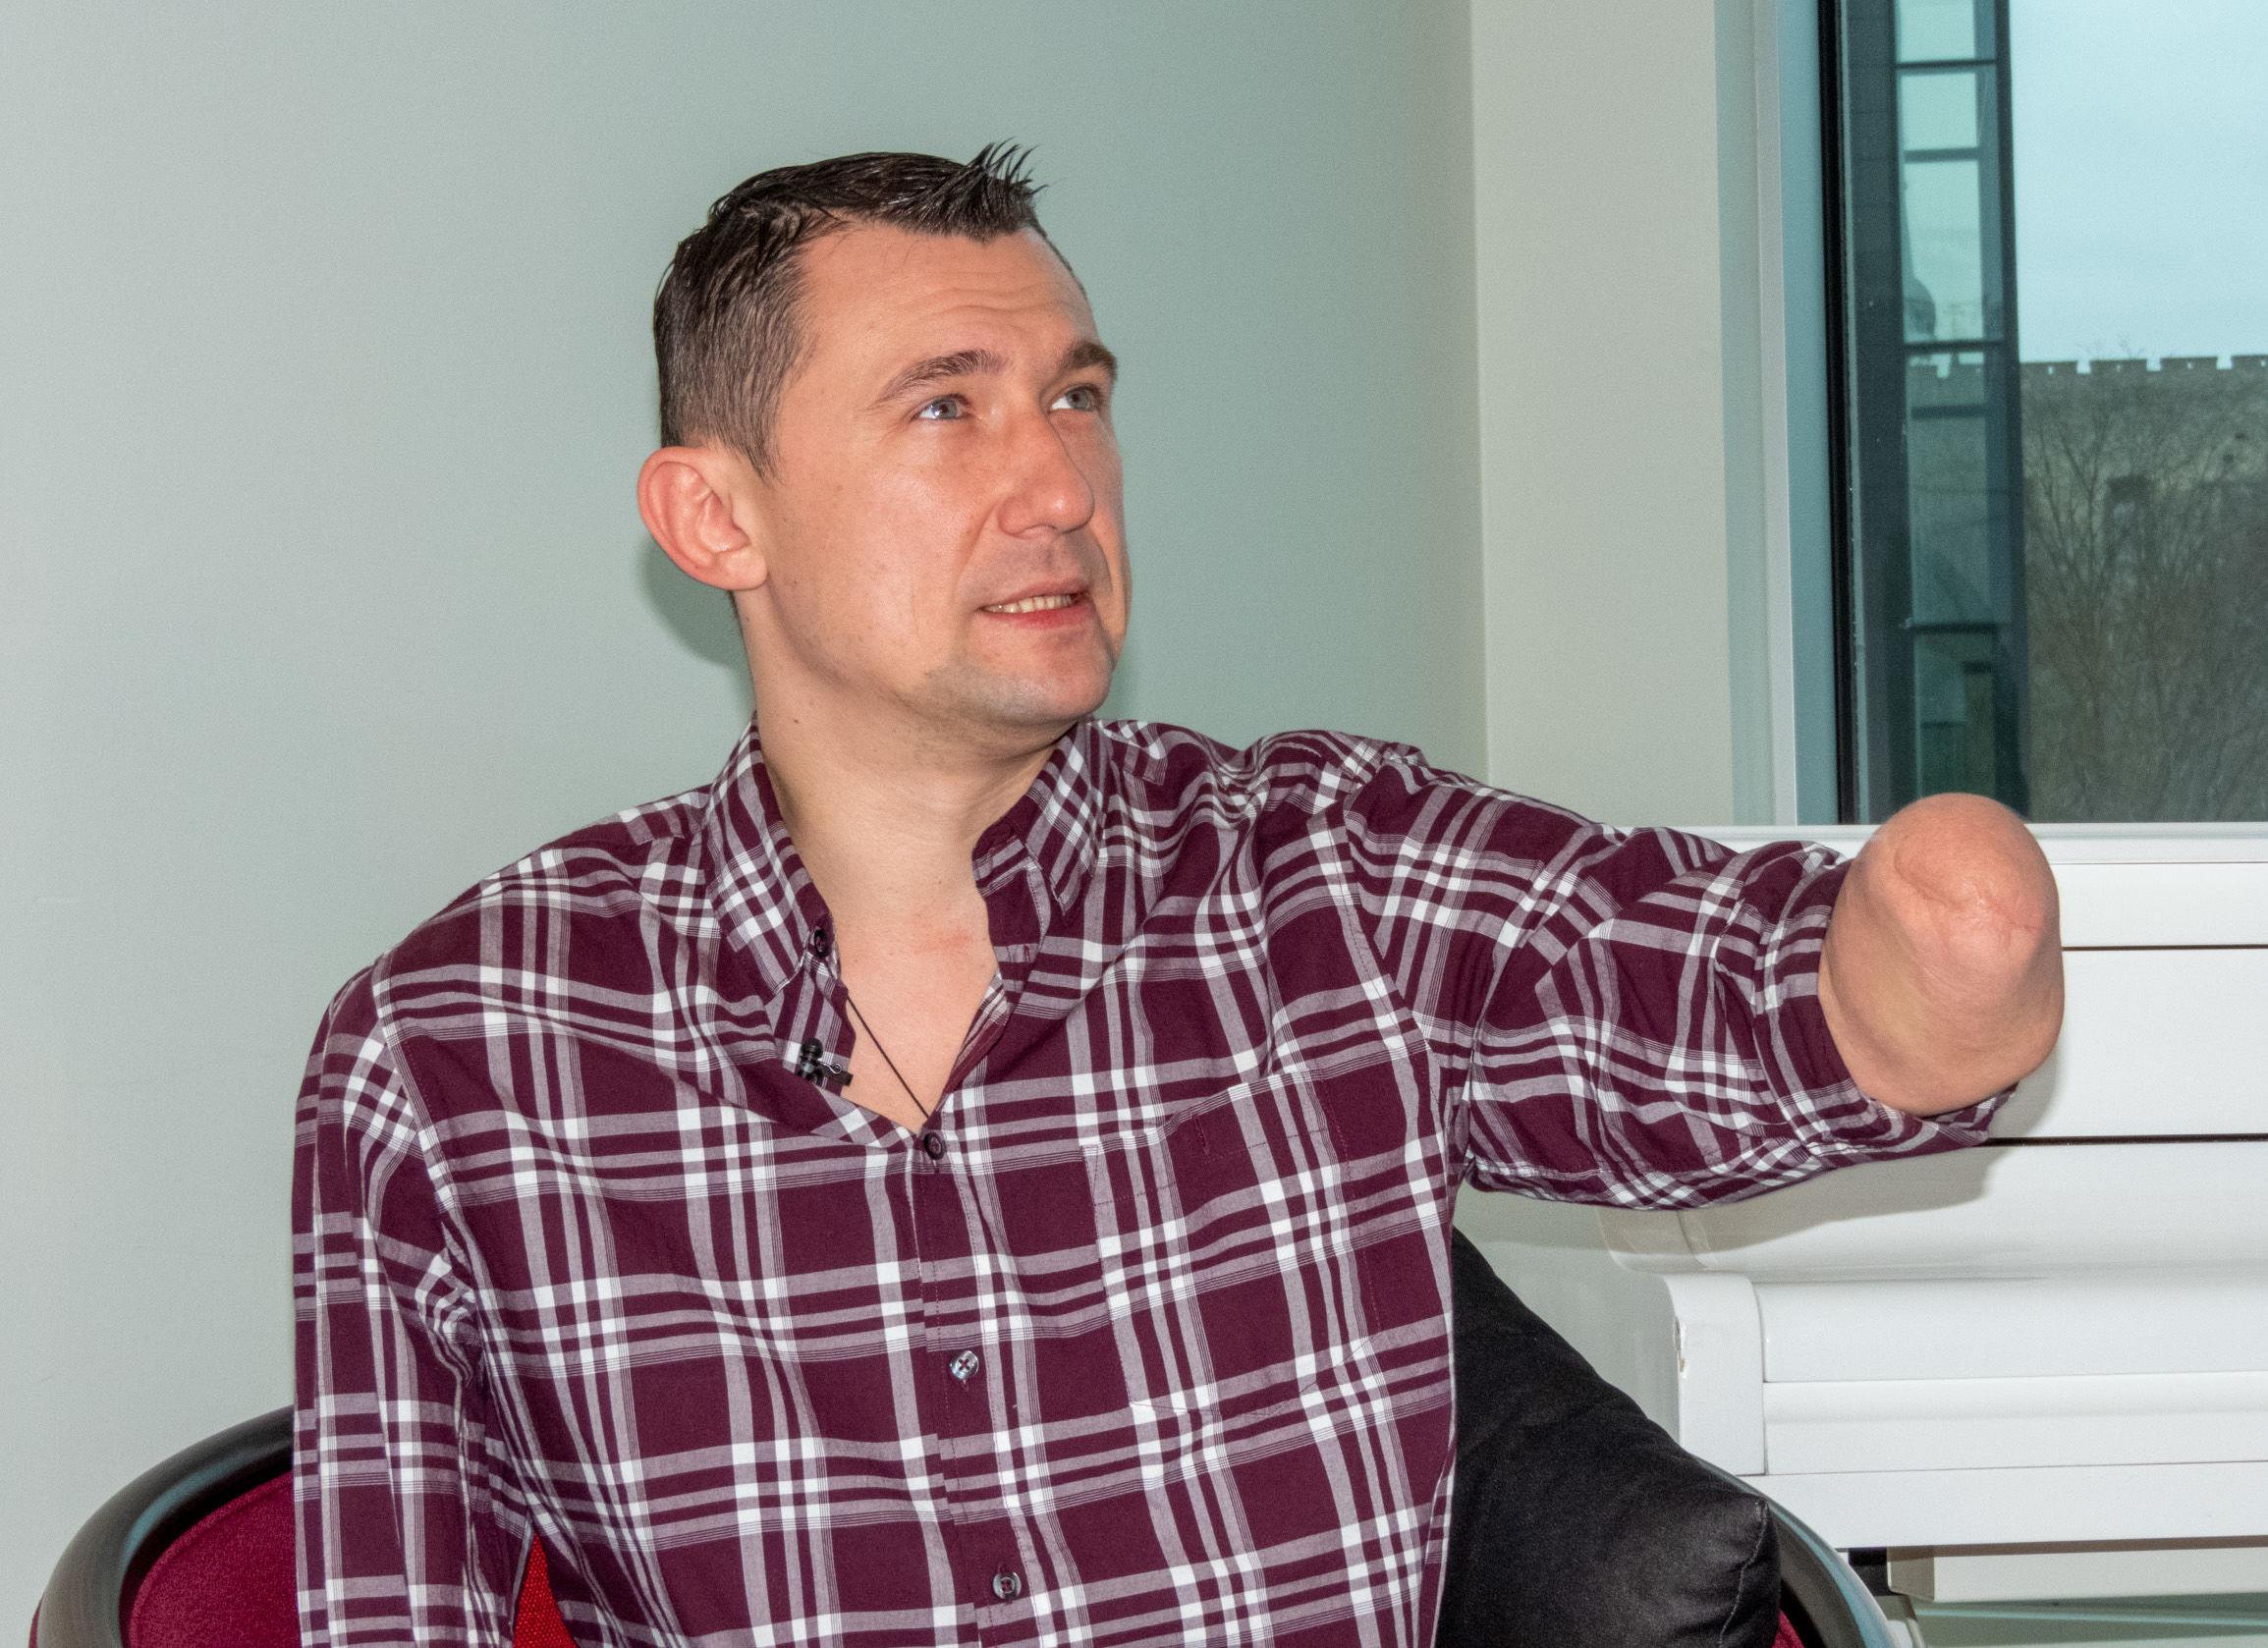 В Таллинн приехал знаменитый паралимпийский рекордсмен из Беларуси Алексей Талай